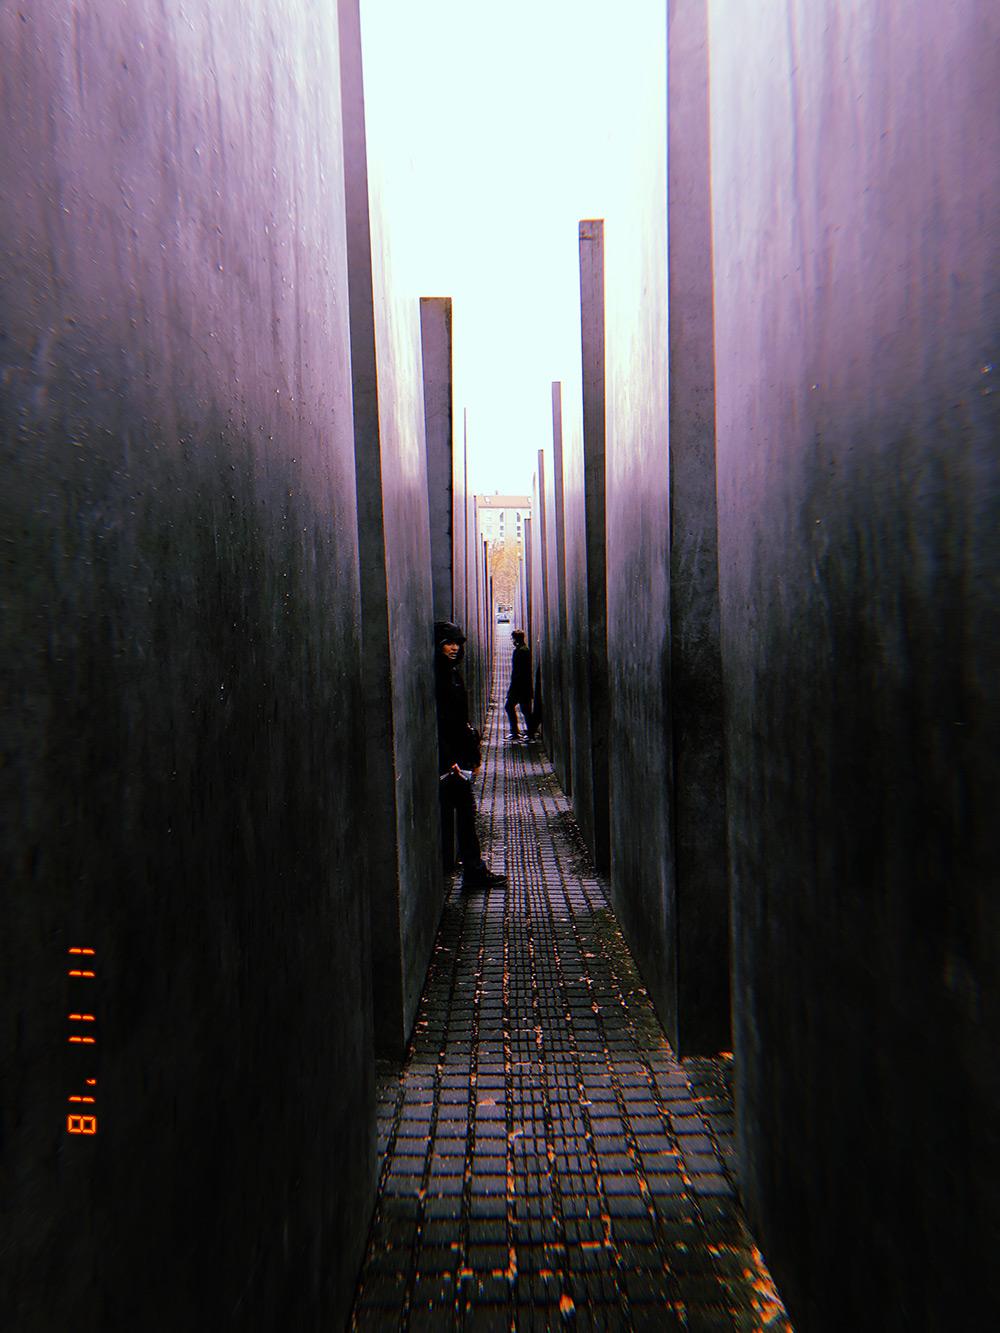 48 Hours in Berlin